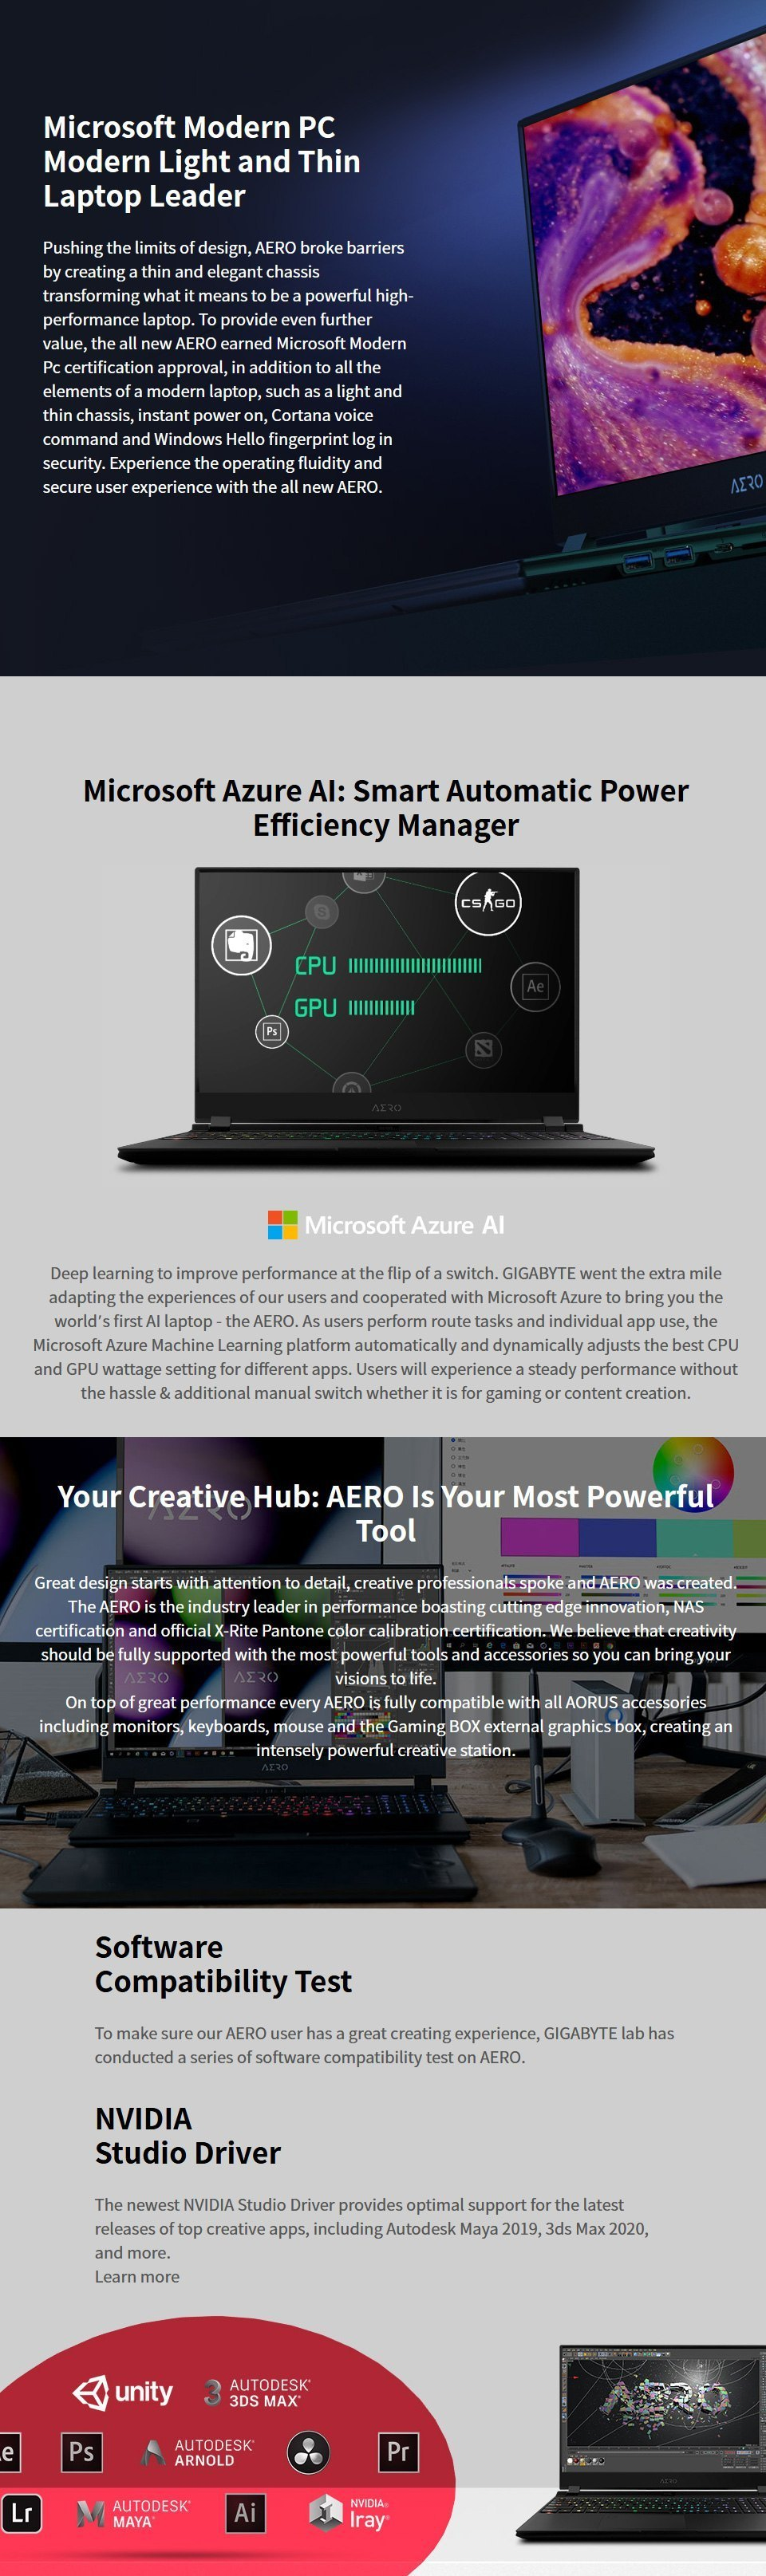 Gigabyte AERO 15 Core i7 RTX 2080 Super 15.6in OLED UHD Laptop features 4